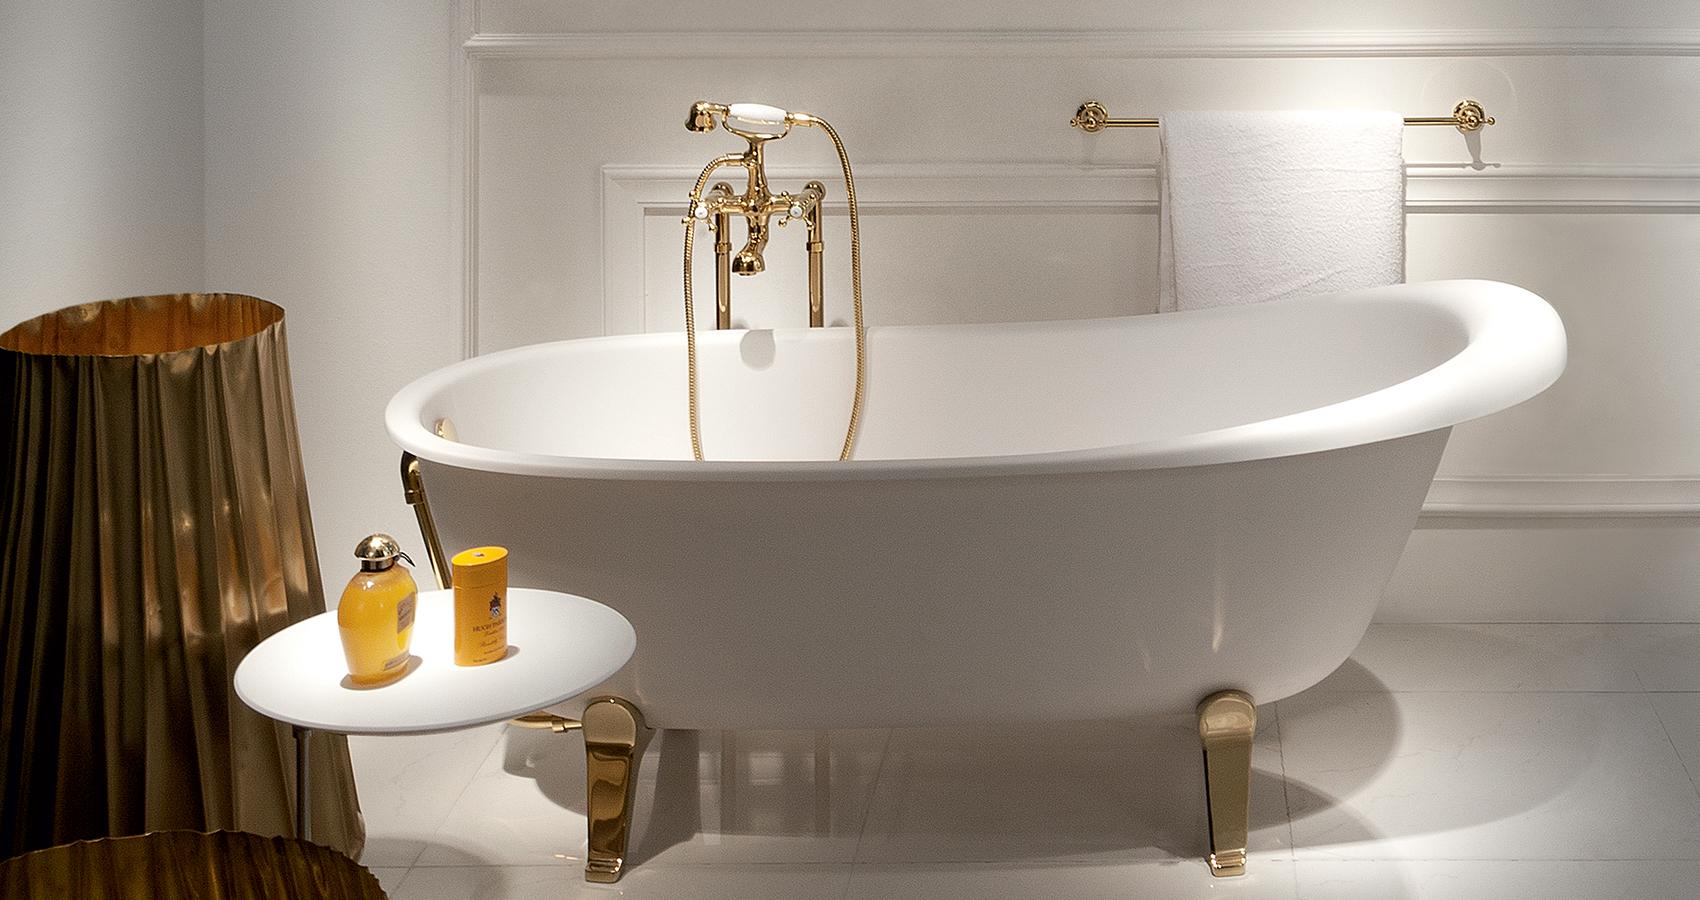 Vasche Da Bagno Zucchetti : Vemat termoidraulica arredamento e sanitari via prenestina